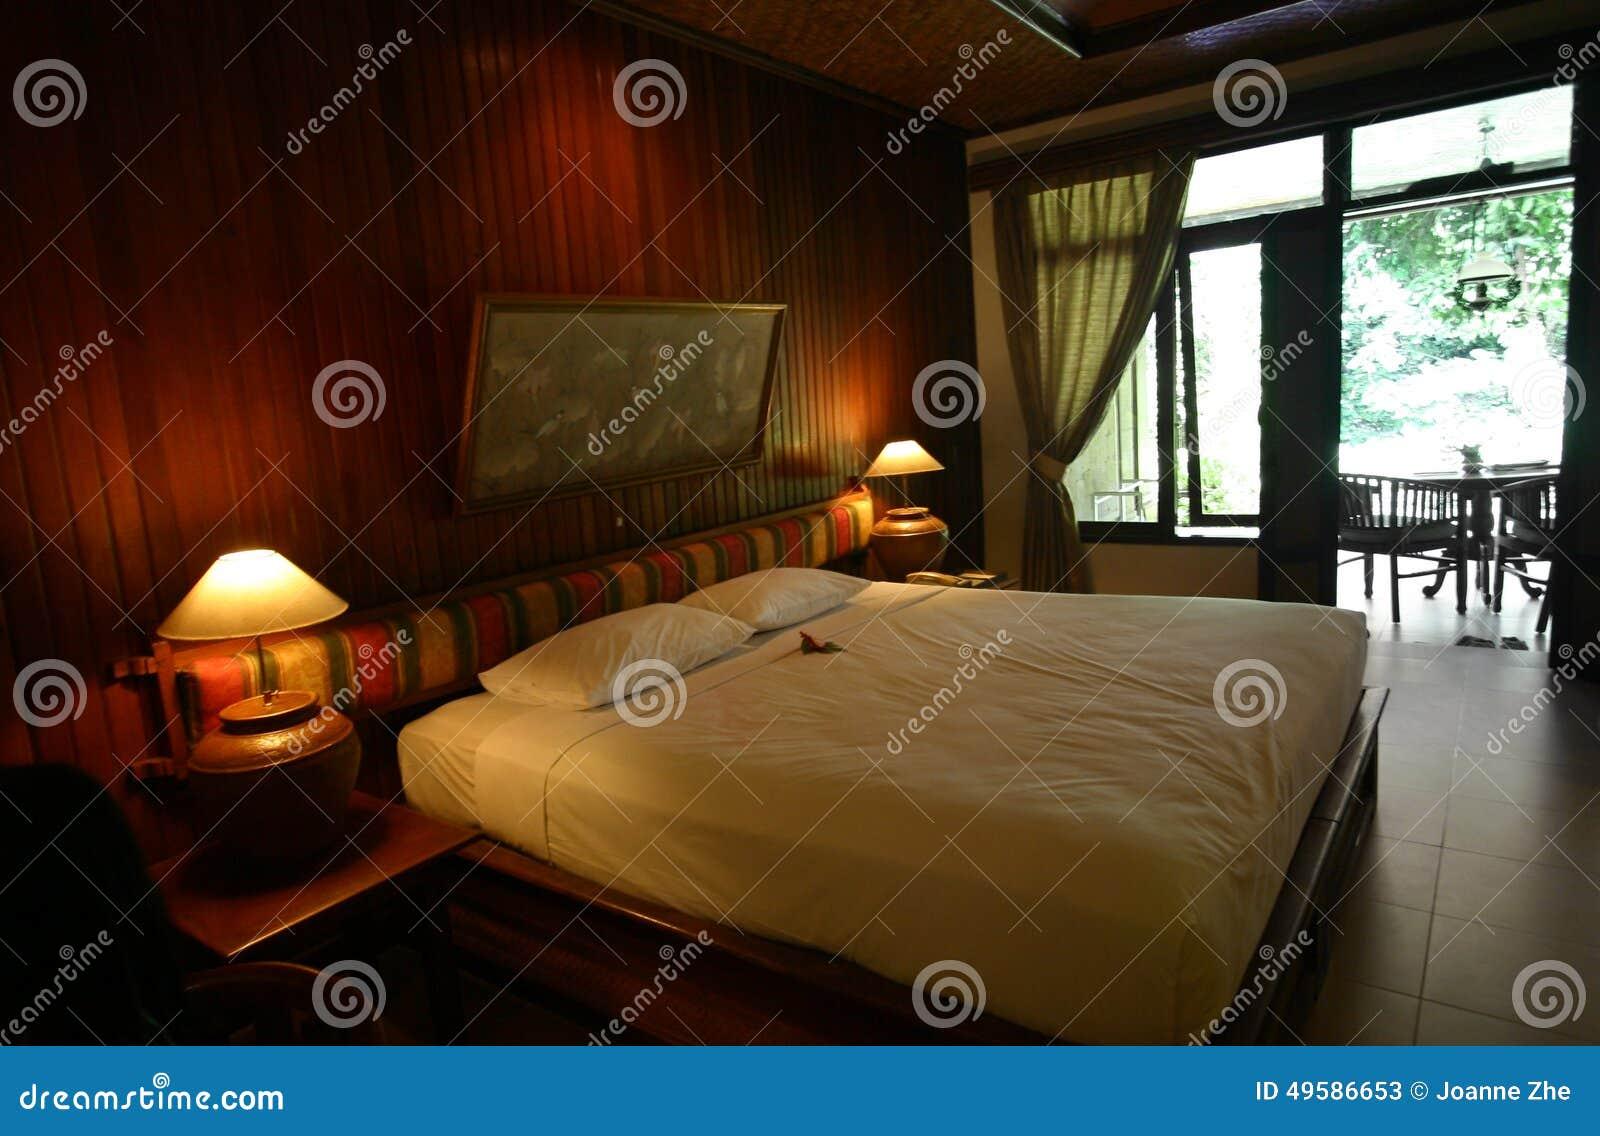 Bali Hotel Bedroom Style Decor